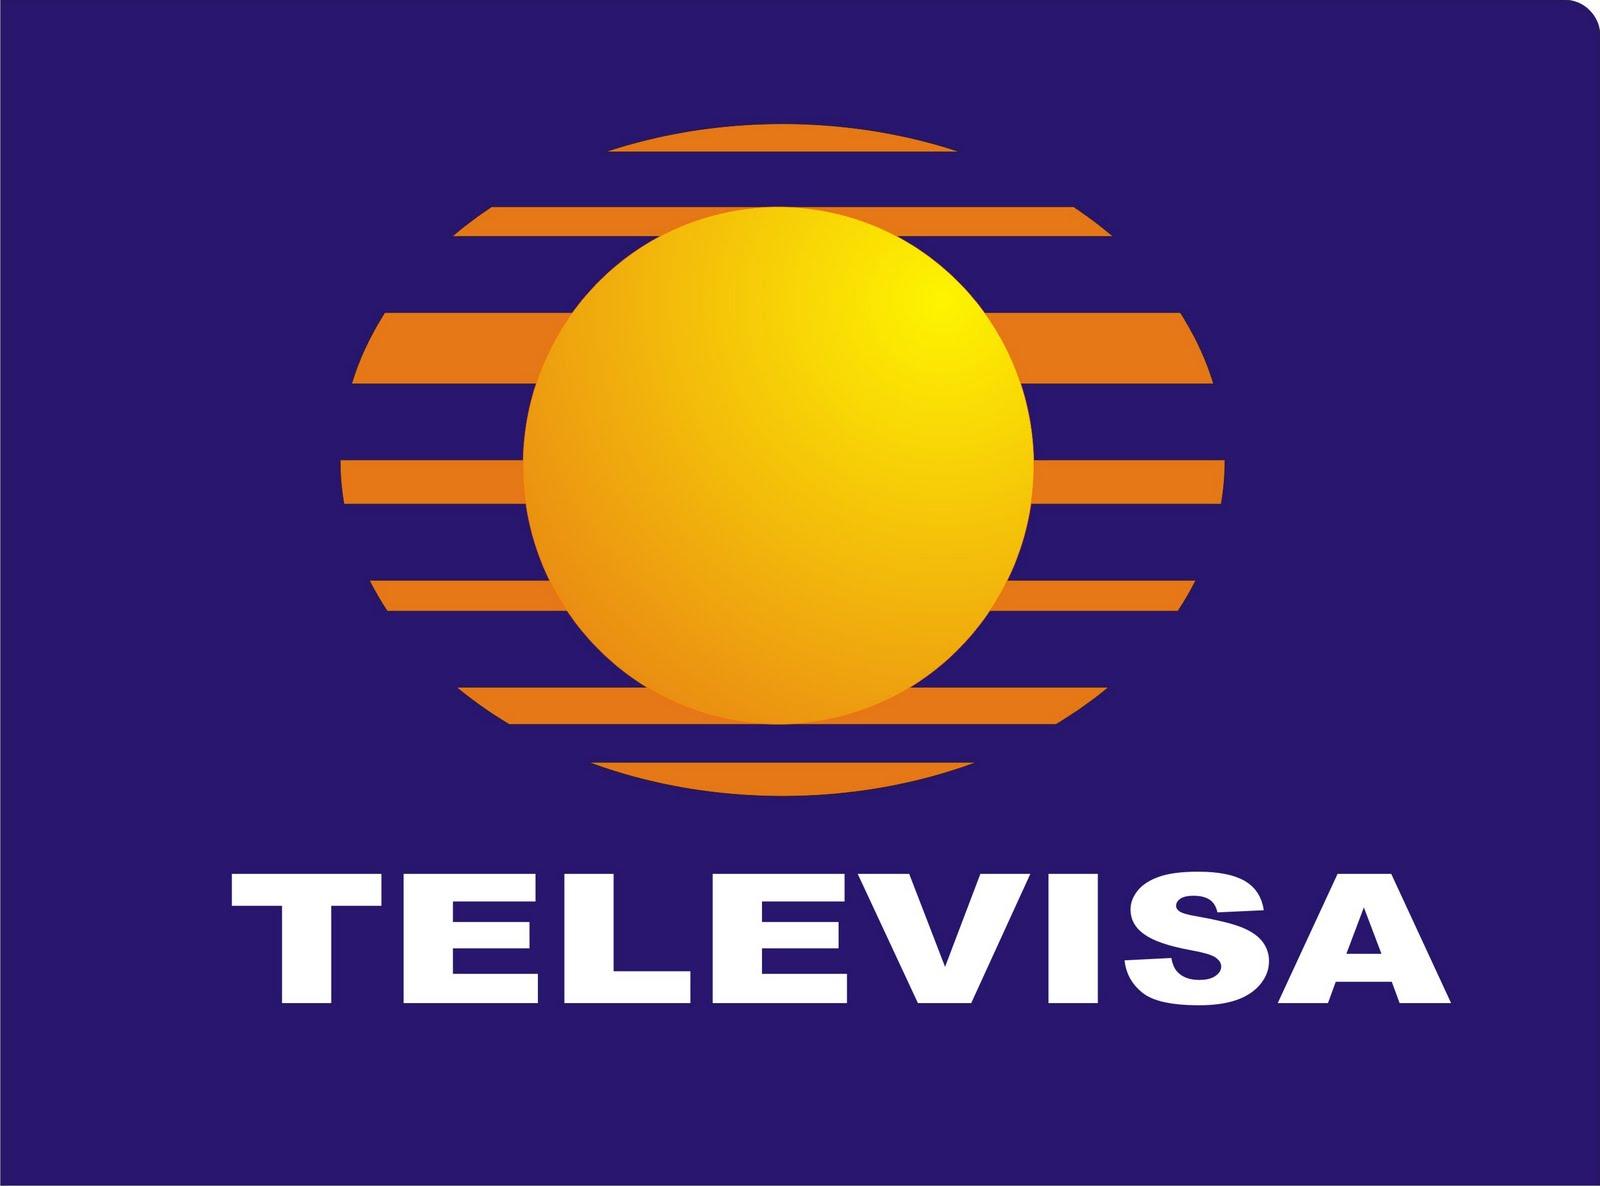 Dmdise os logotipo de televisa for Espectaculos recientes de televisa